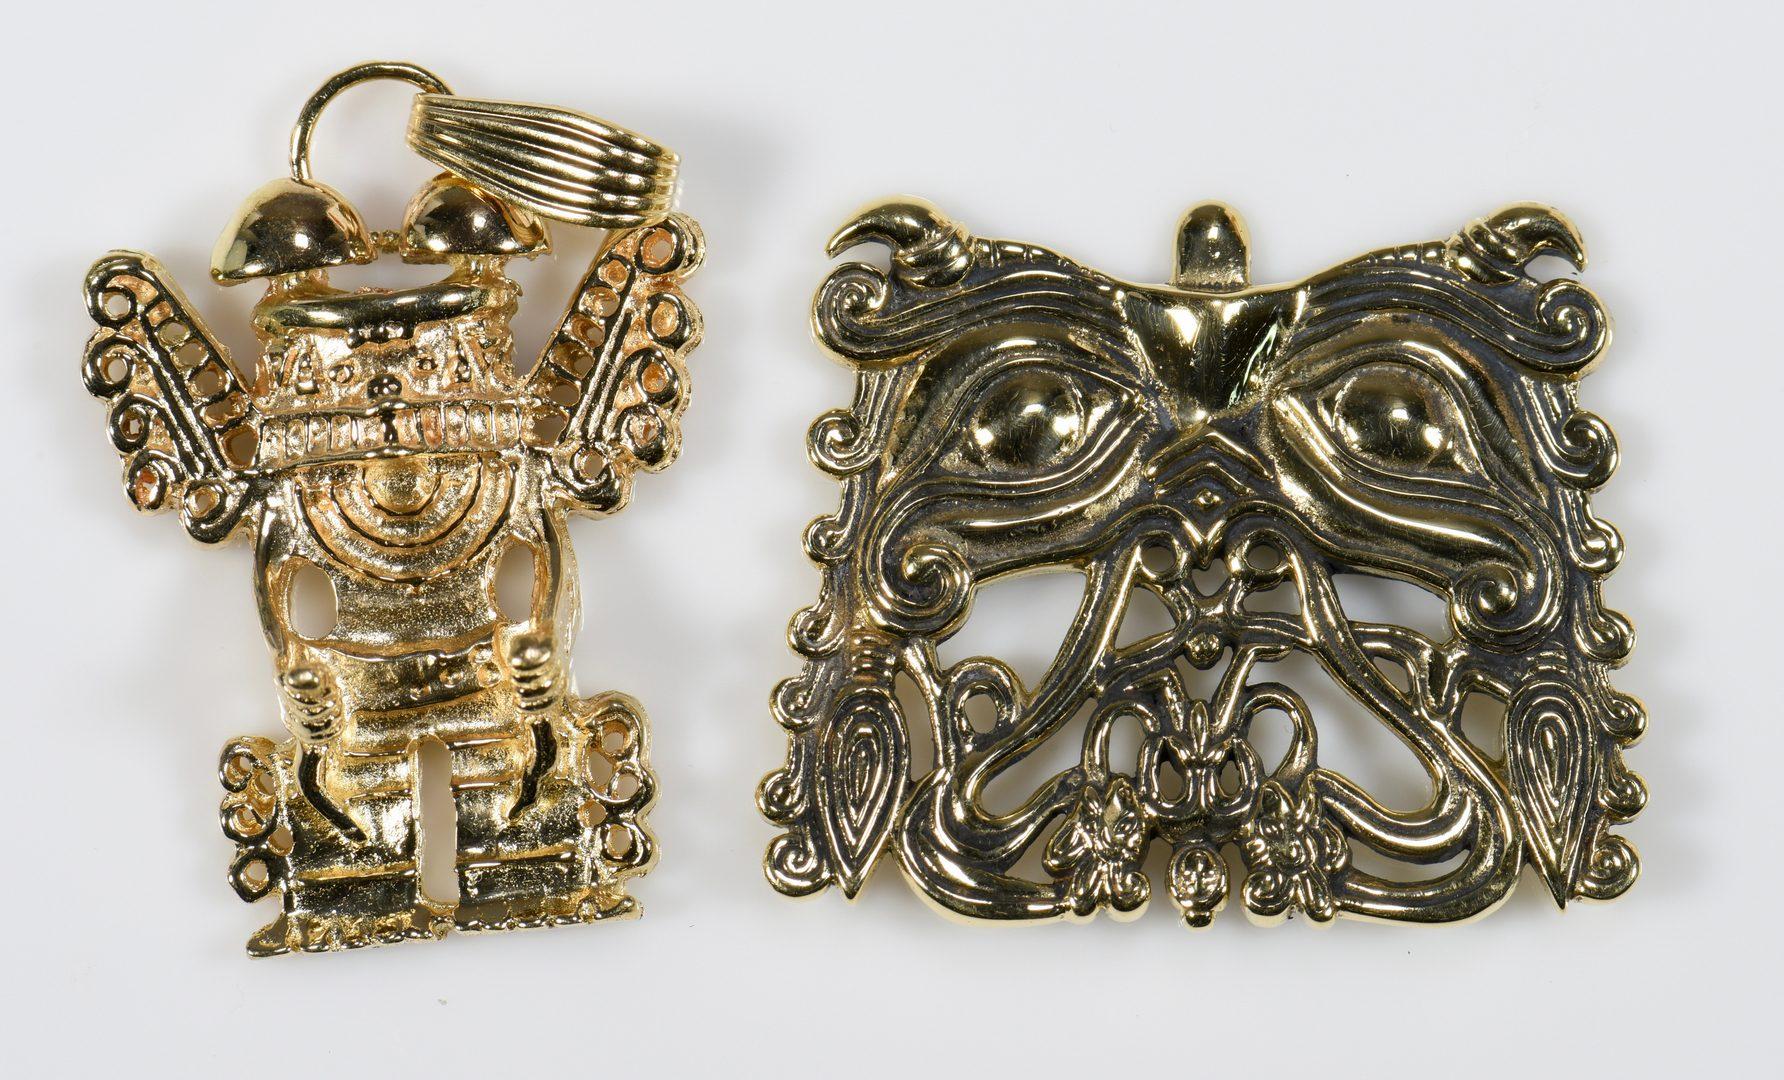 Lot 940: 14K Pendants of Ancient Civilizations, 7 Items